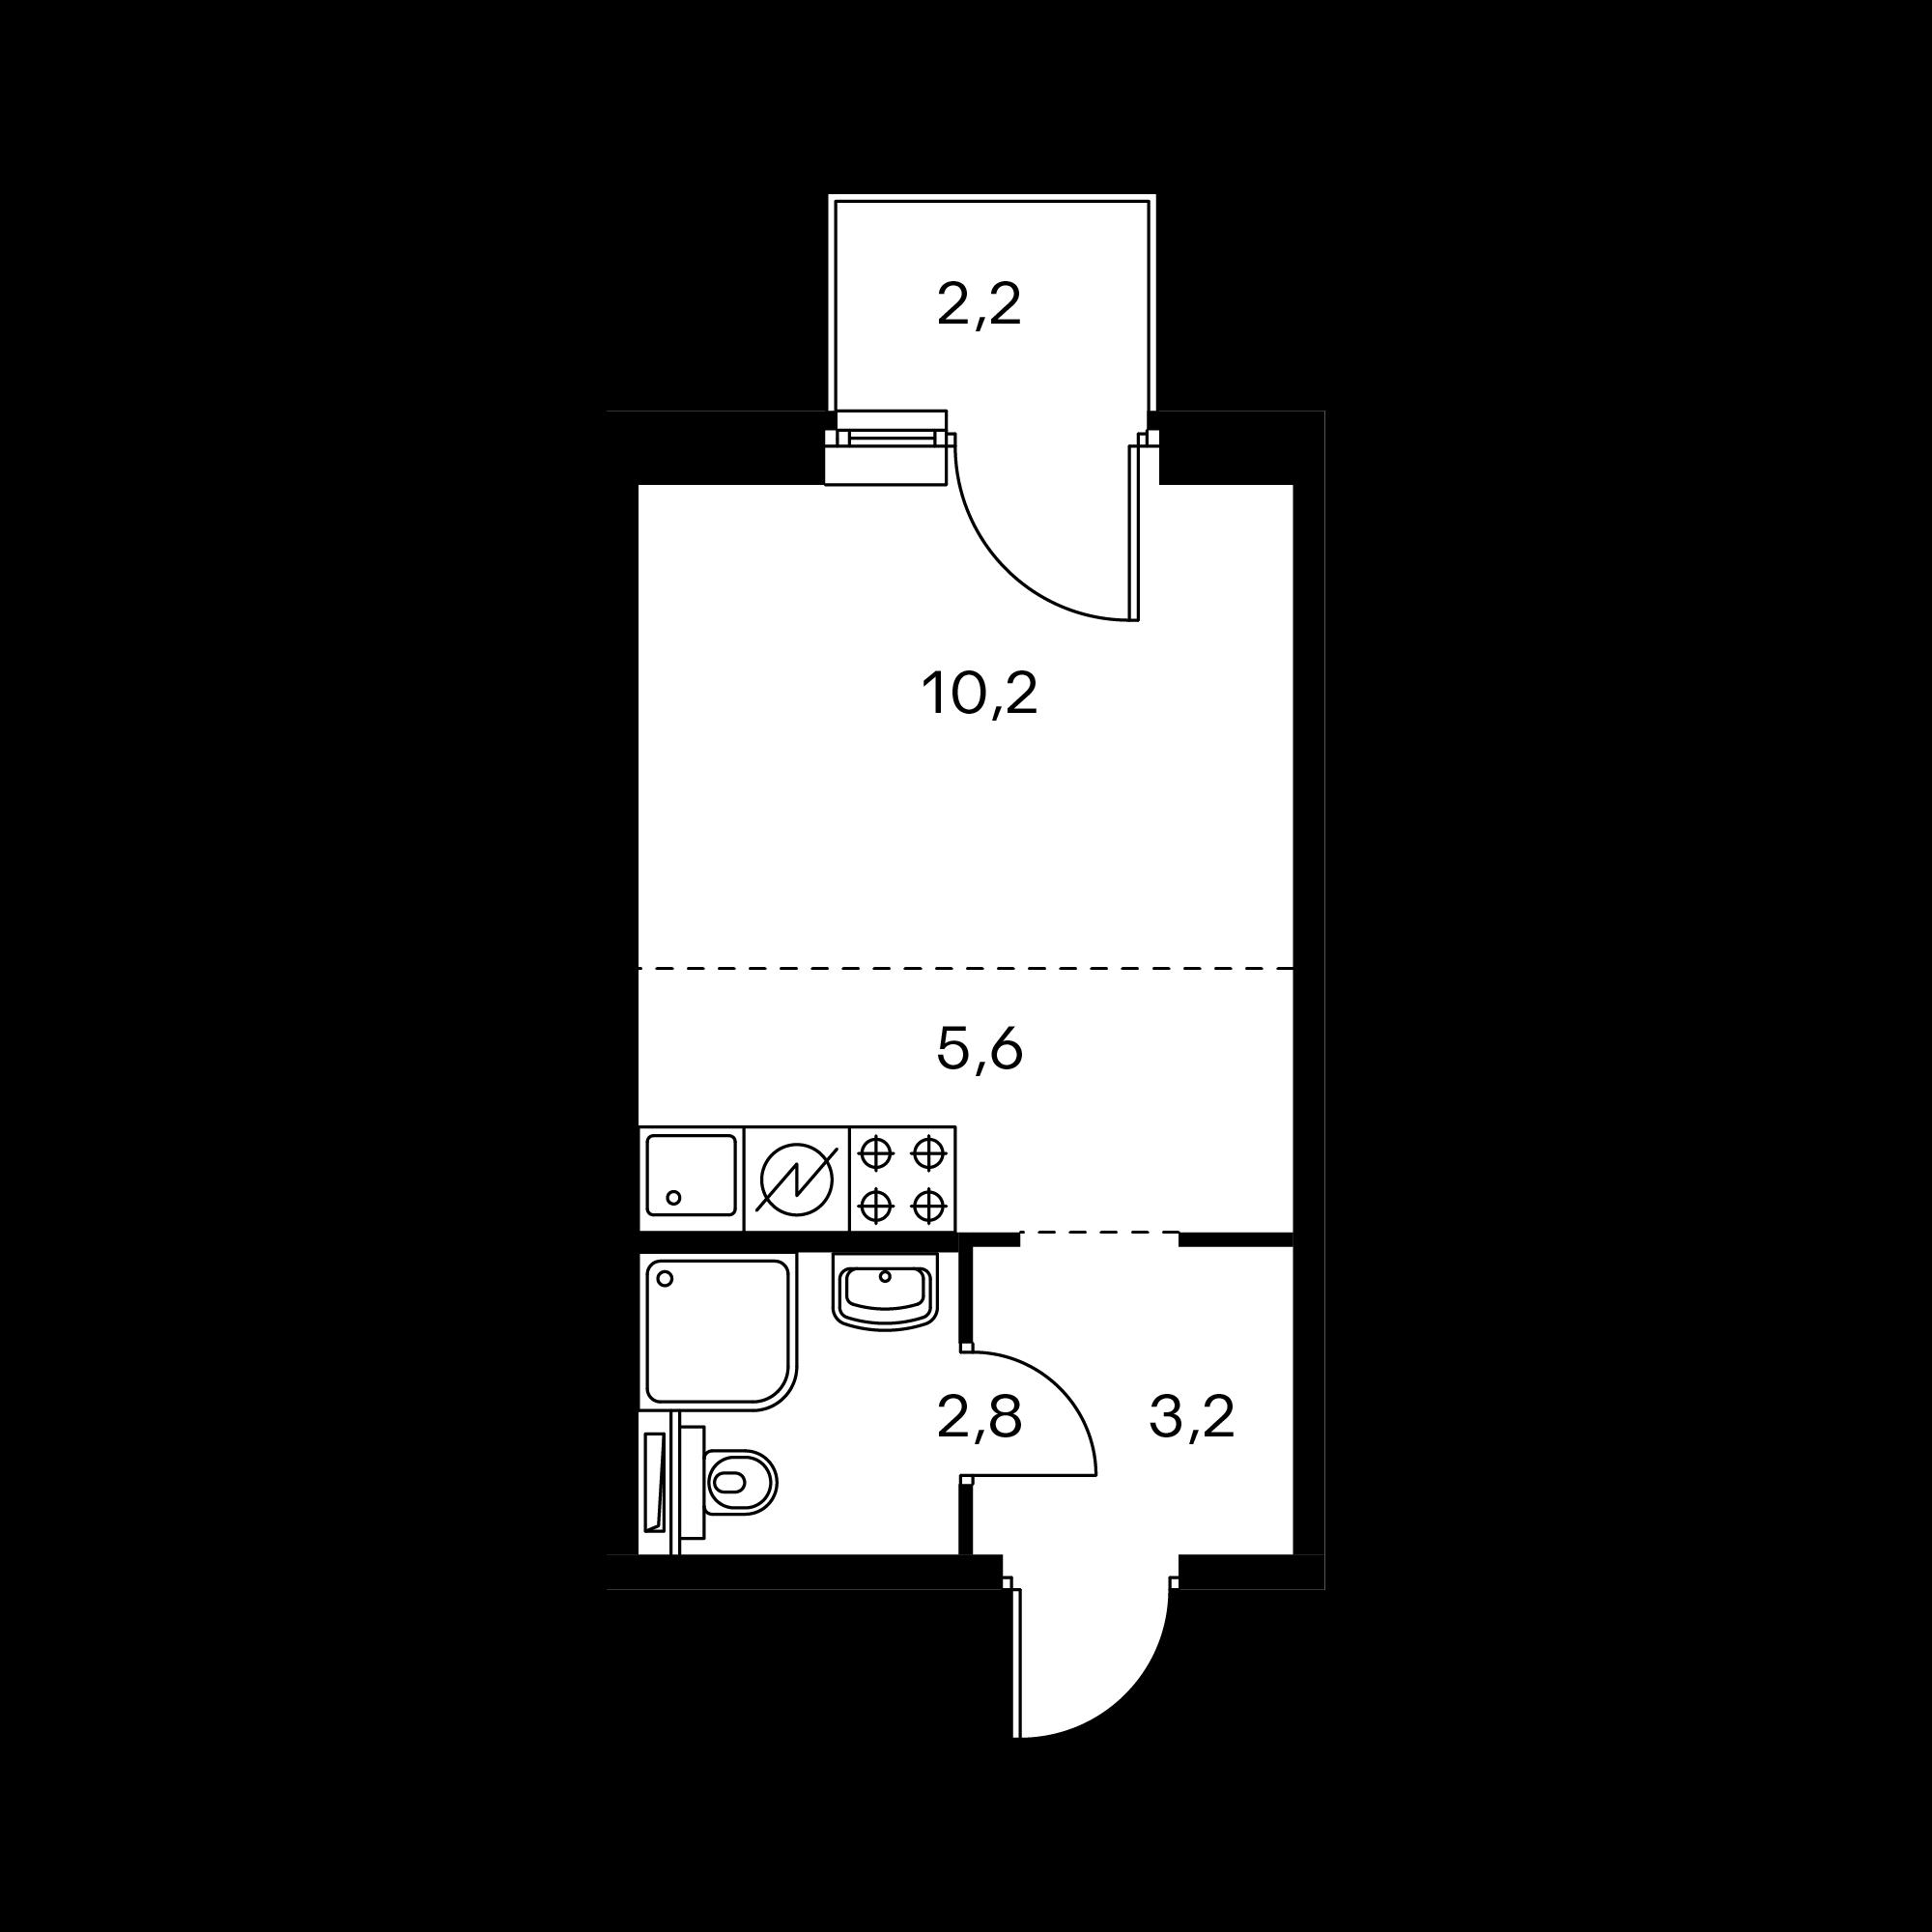 1NS1_3.9-1_B(2,2)